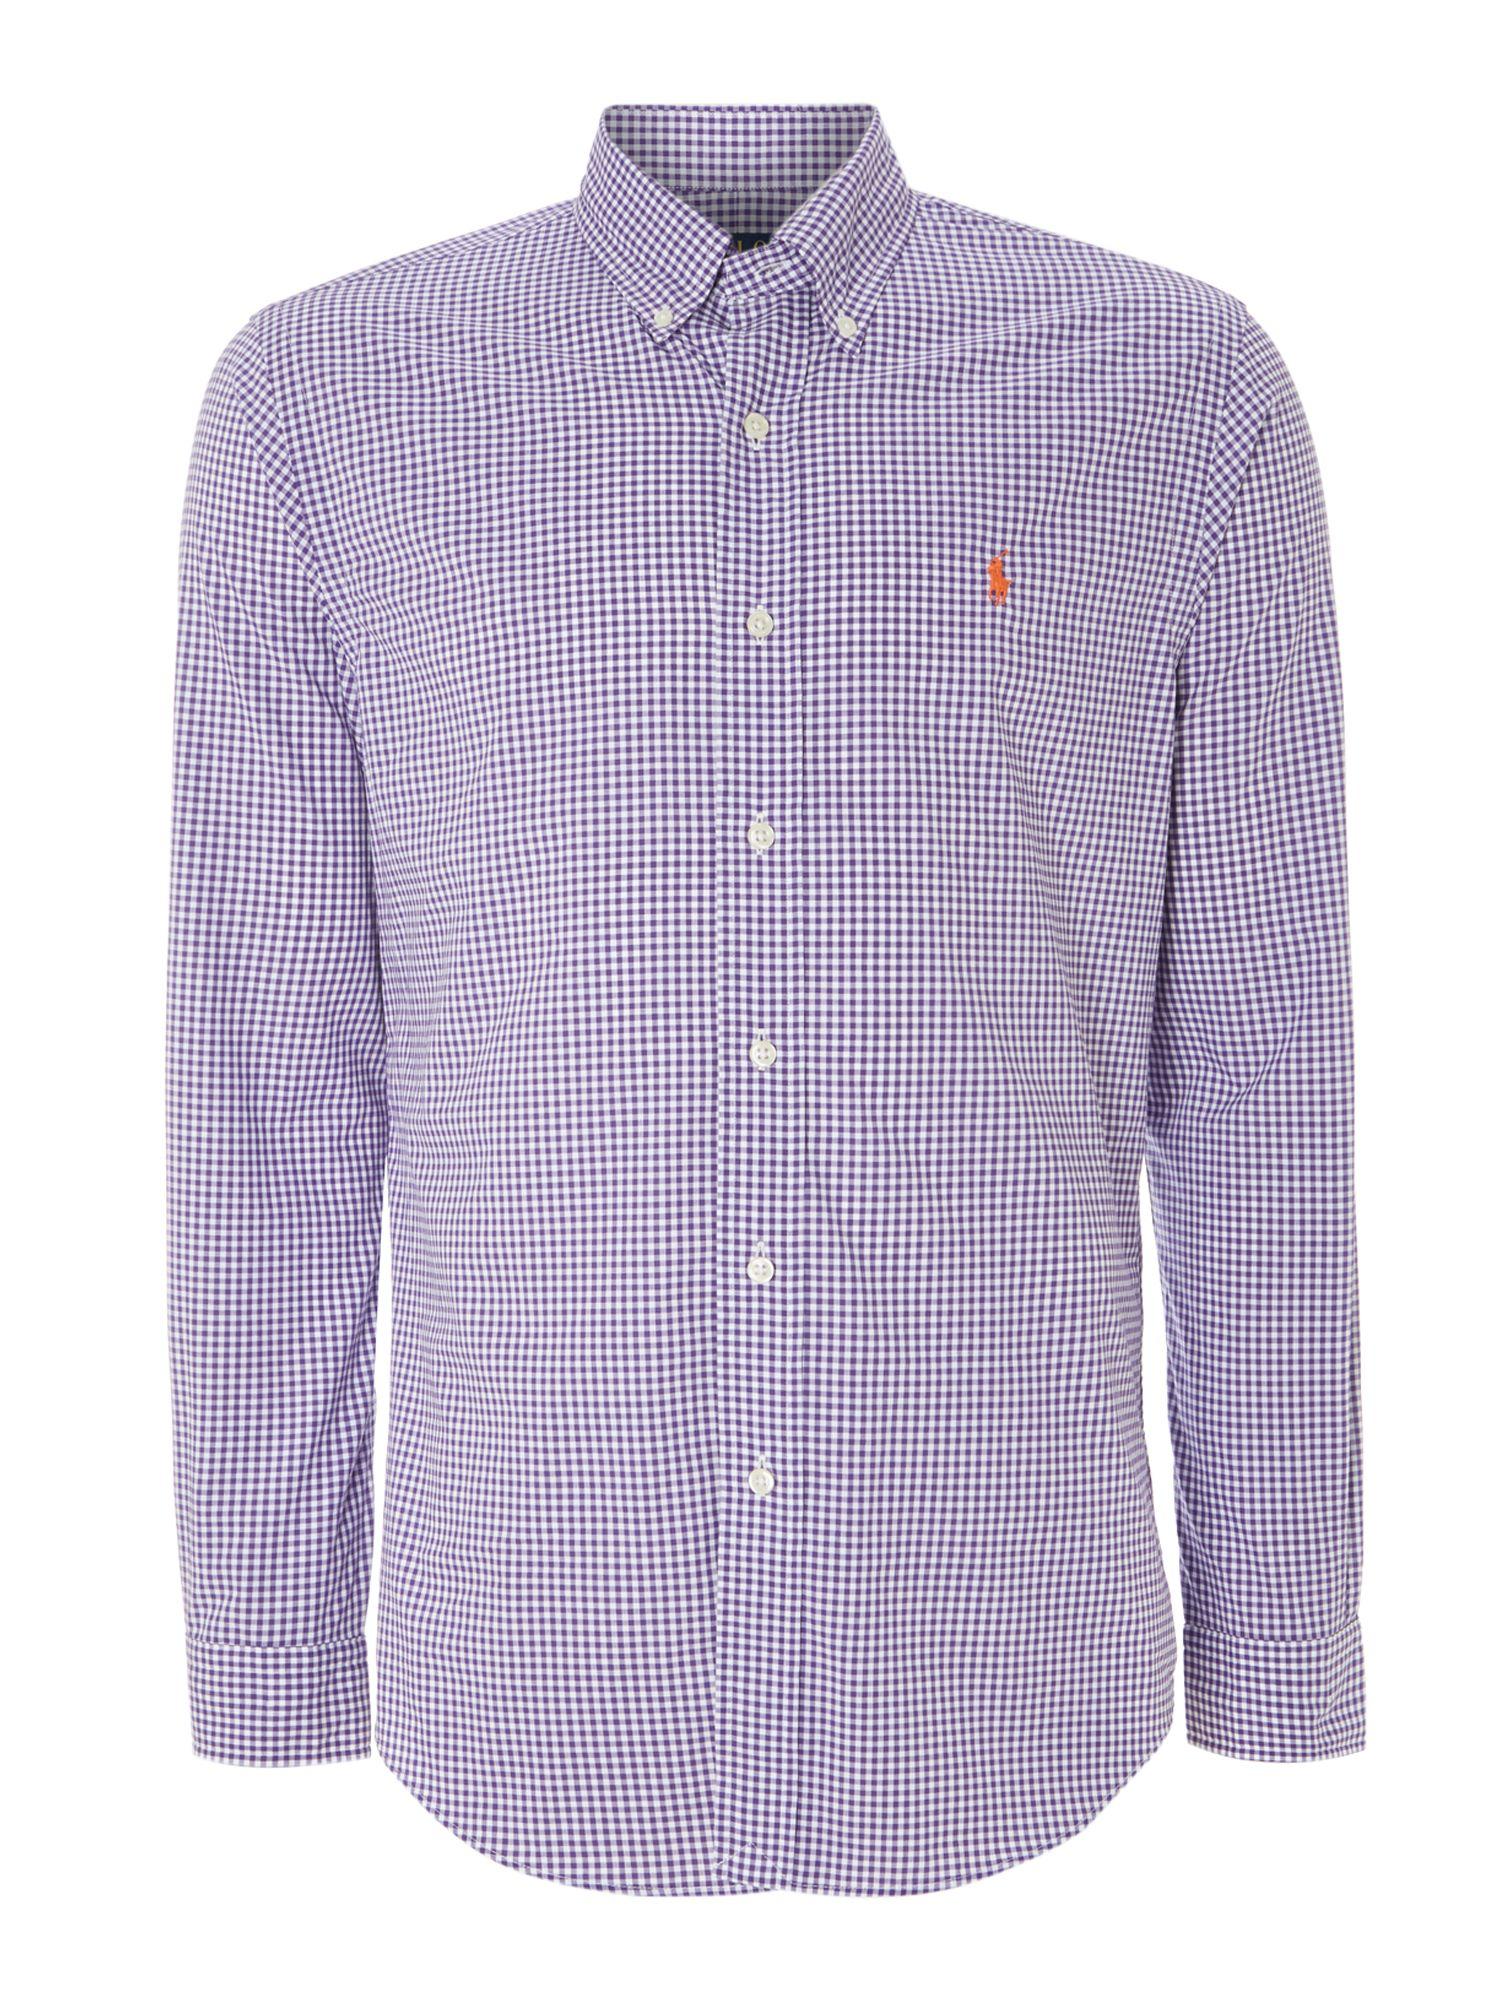 Polo ralph lauren long sleeve slim fit mini gingham shirt for Long sleeve purple polo shirt